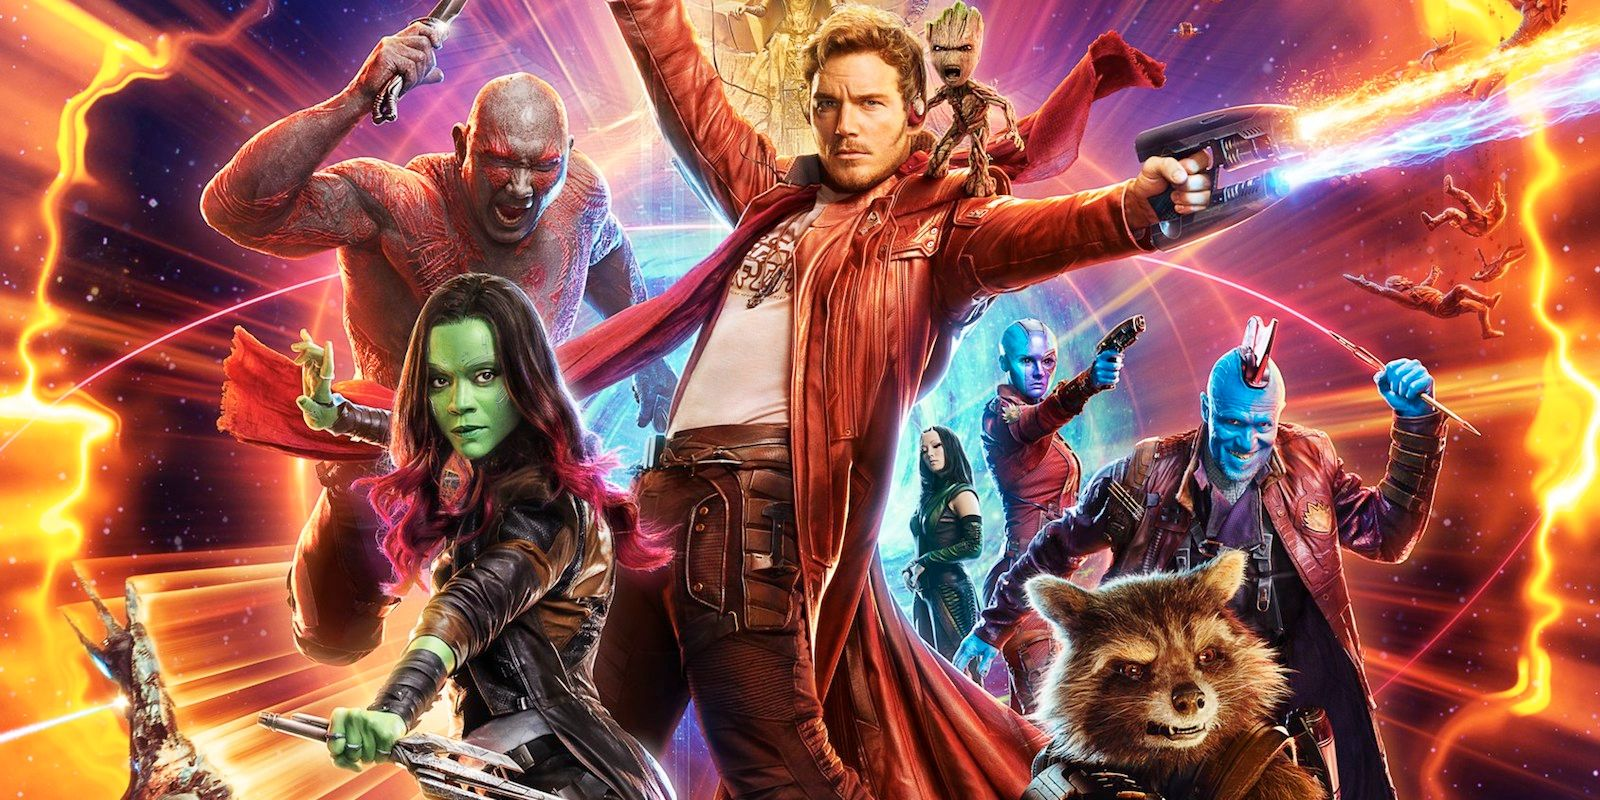 https://static0.srcdn.com/wp-content/uploads/2017/02/Guardians-of-the-Galaxy-Vol-2-wallpaper.jpg